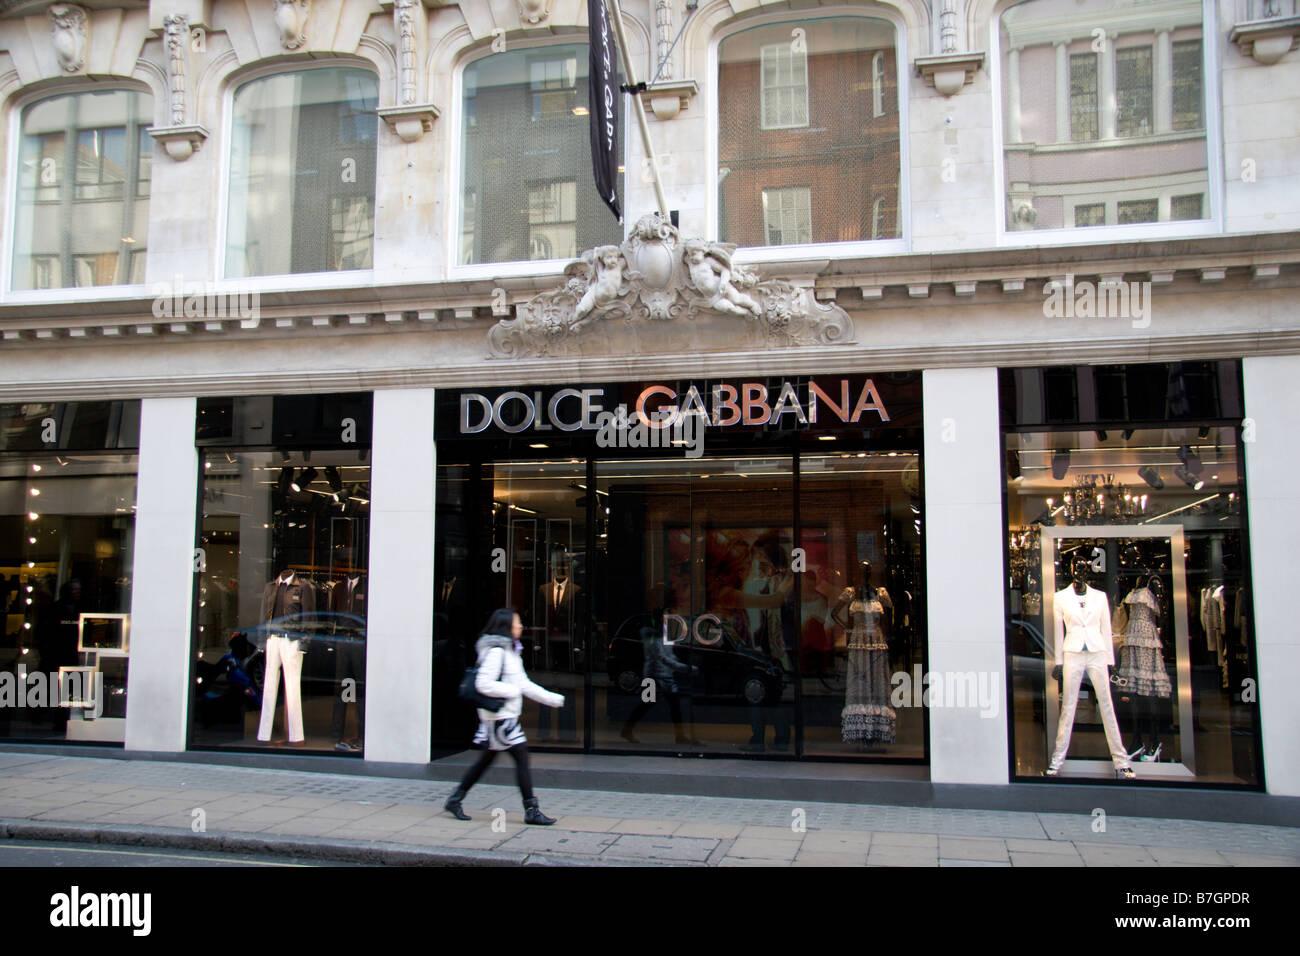 Pedestrian passing the Dolce & Gabbana store on Old Bond Street, London.  Jan 2009 - Stock Image